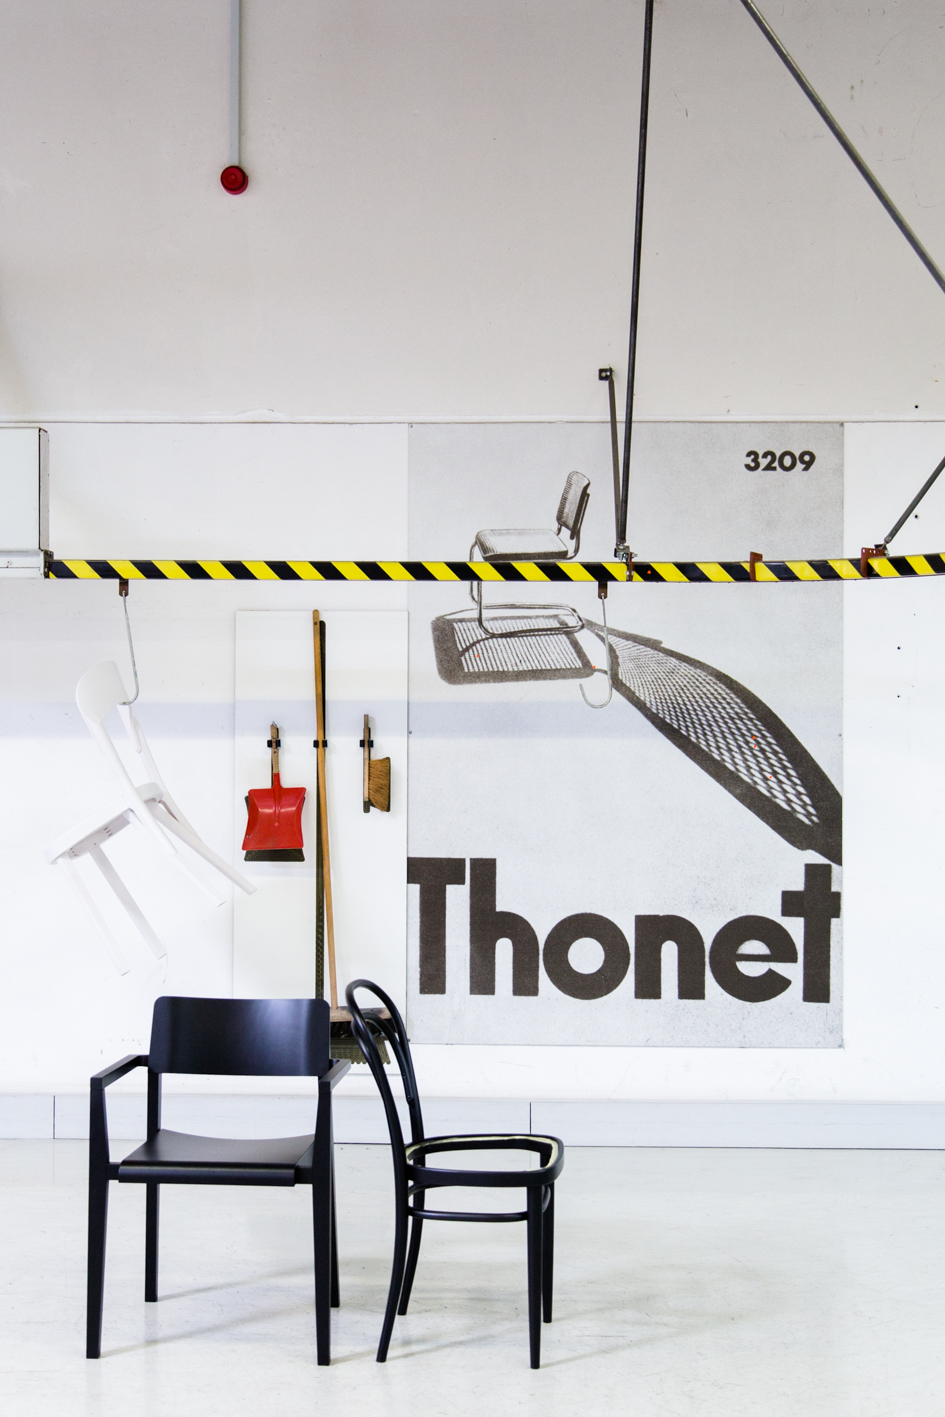 thonet_web-3512.jpg